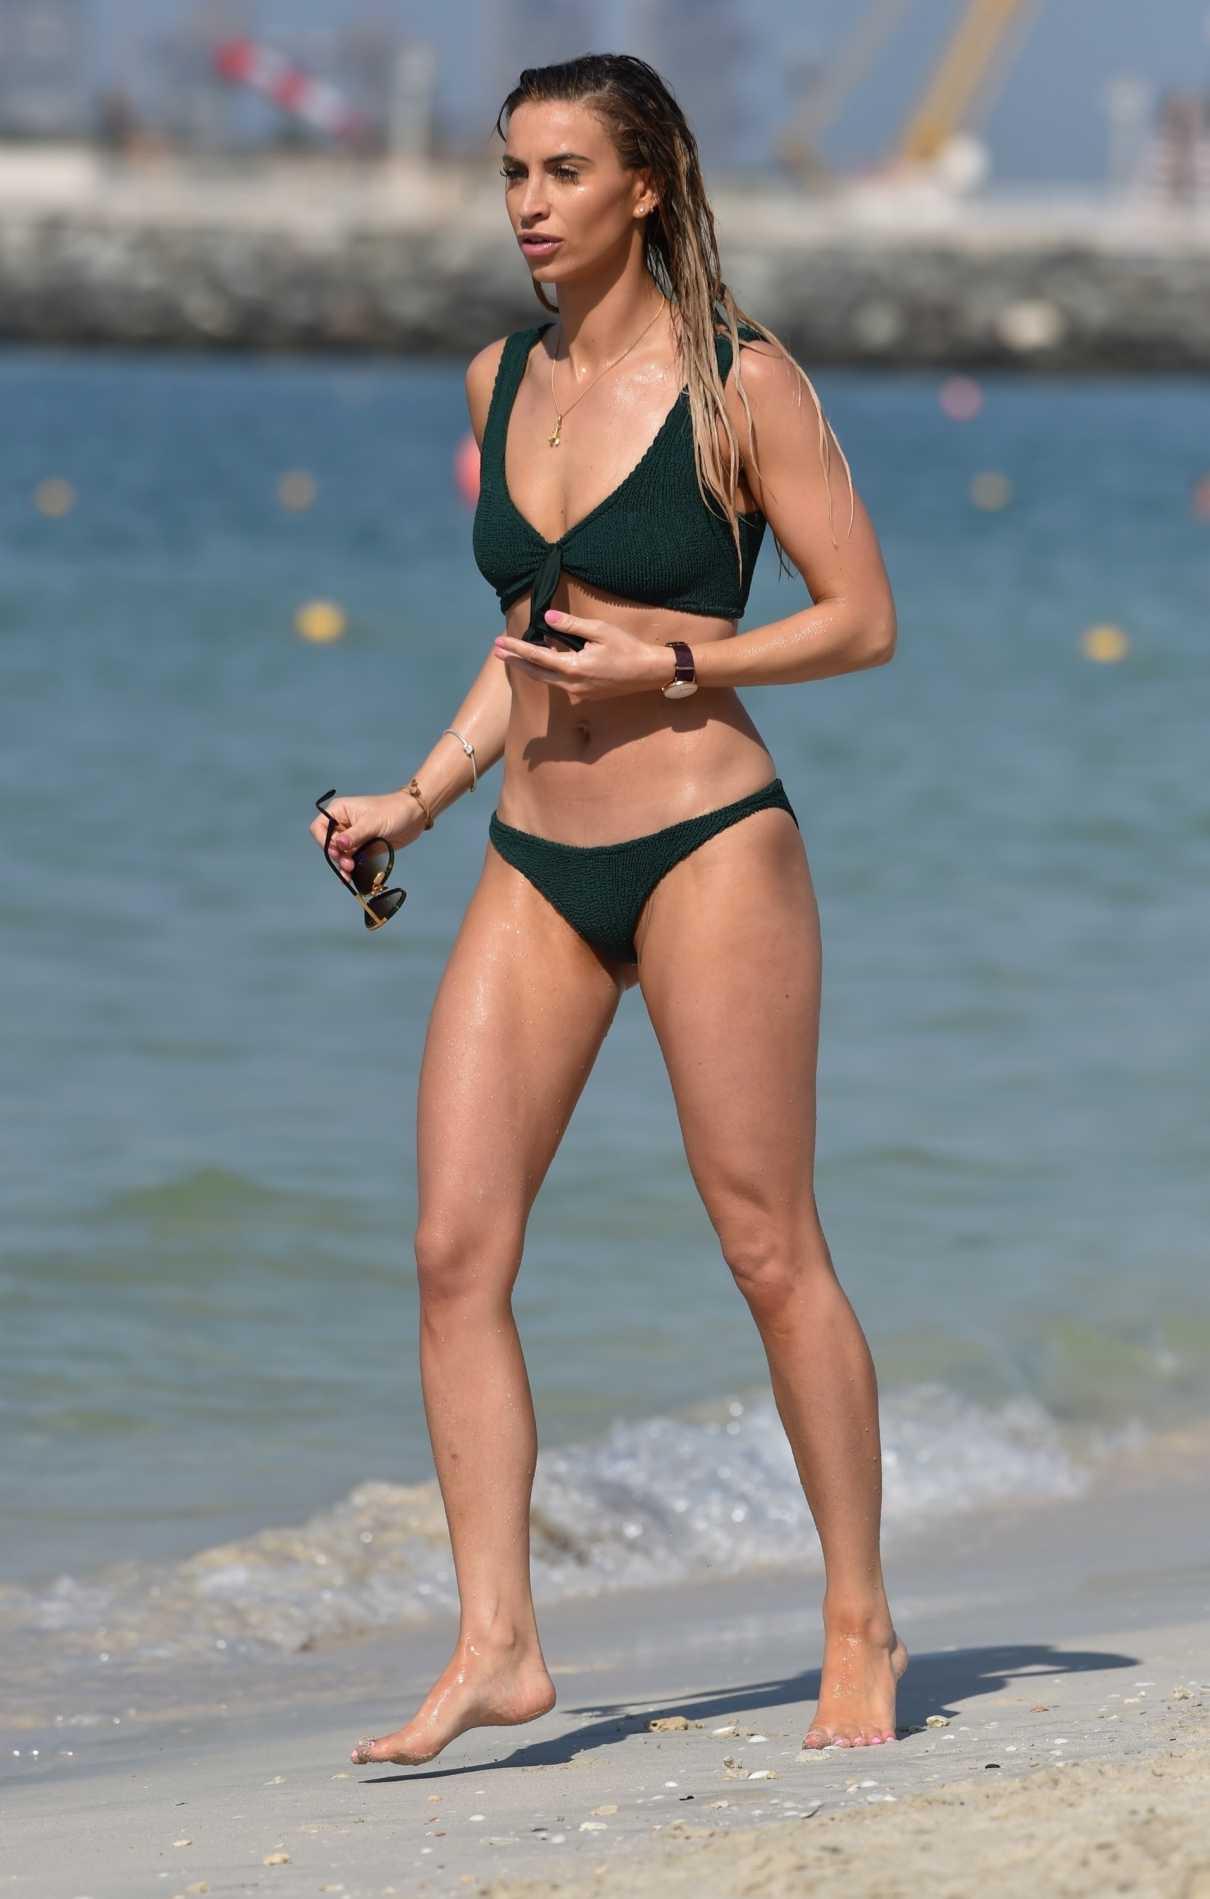 Ferne McCann in a Green Bikini